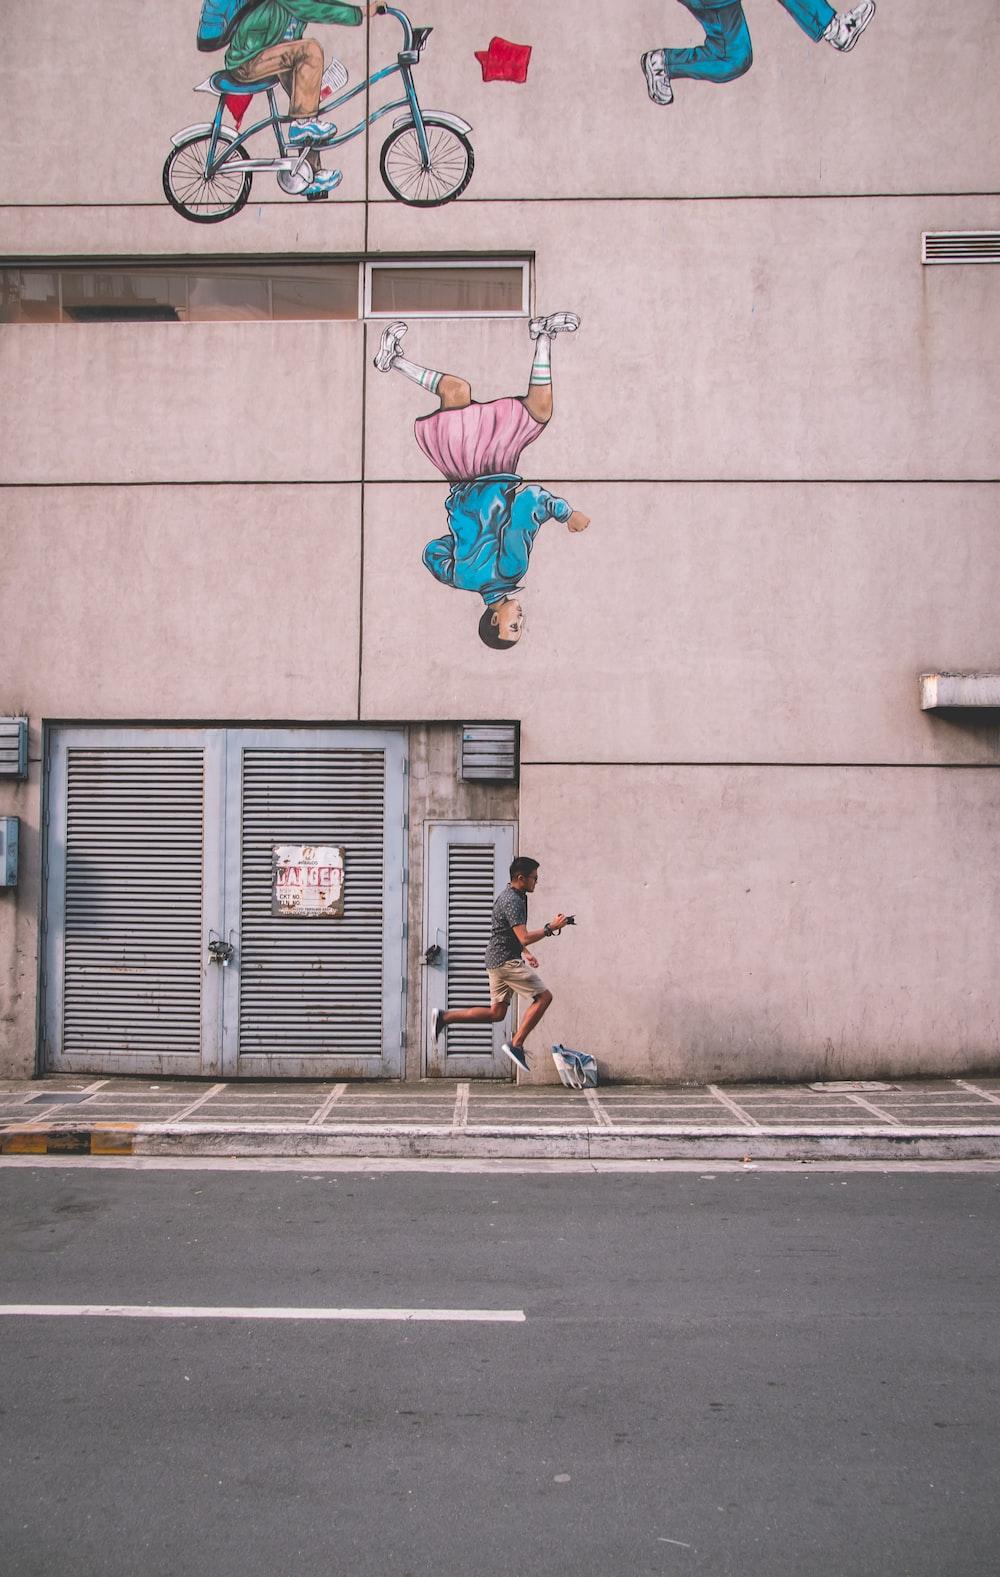 man jumping beside building during daytime